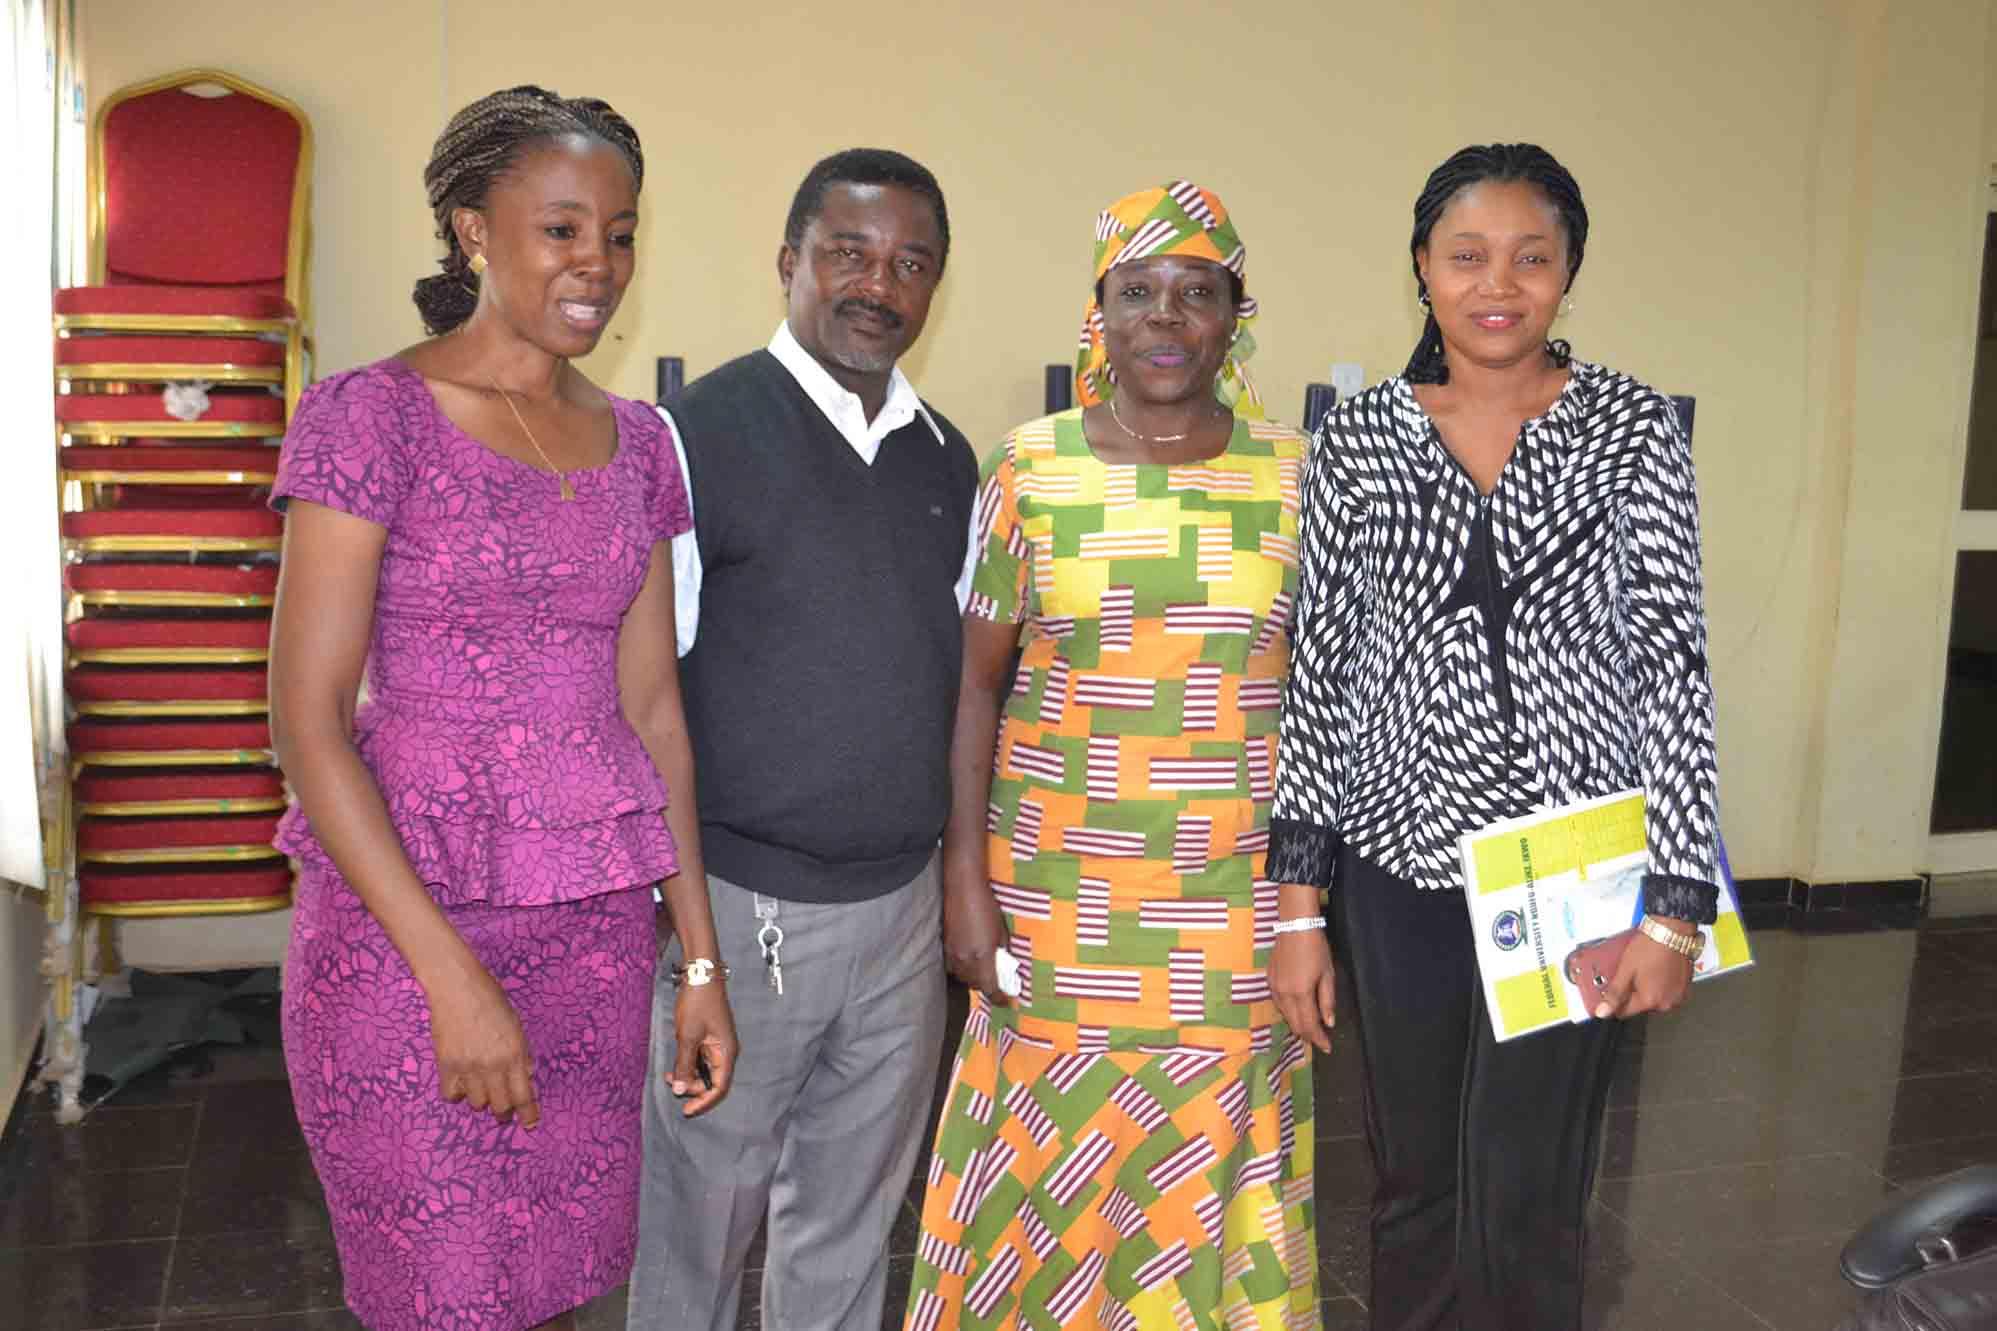 Group photograph with members of the University team. Left to right: Ms Chiaka Nnodi, Mr Sam Echem, Prof G.M.T Emezue, Barr Ogochukwu